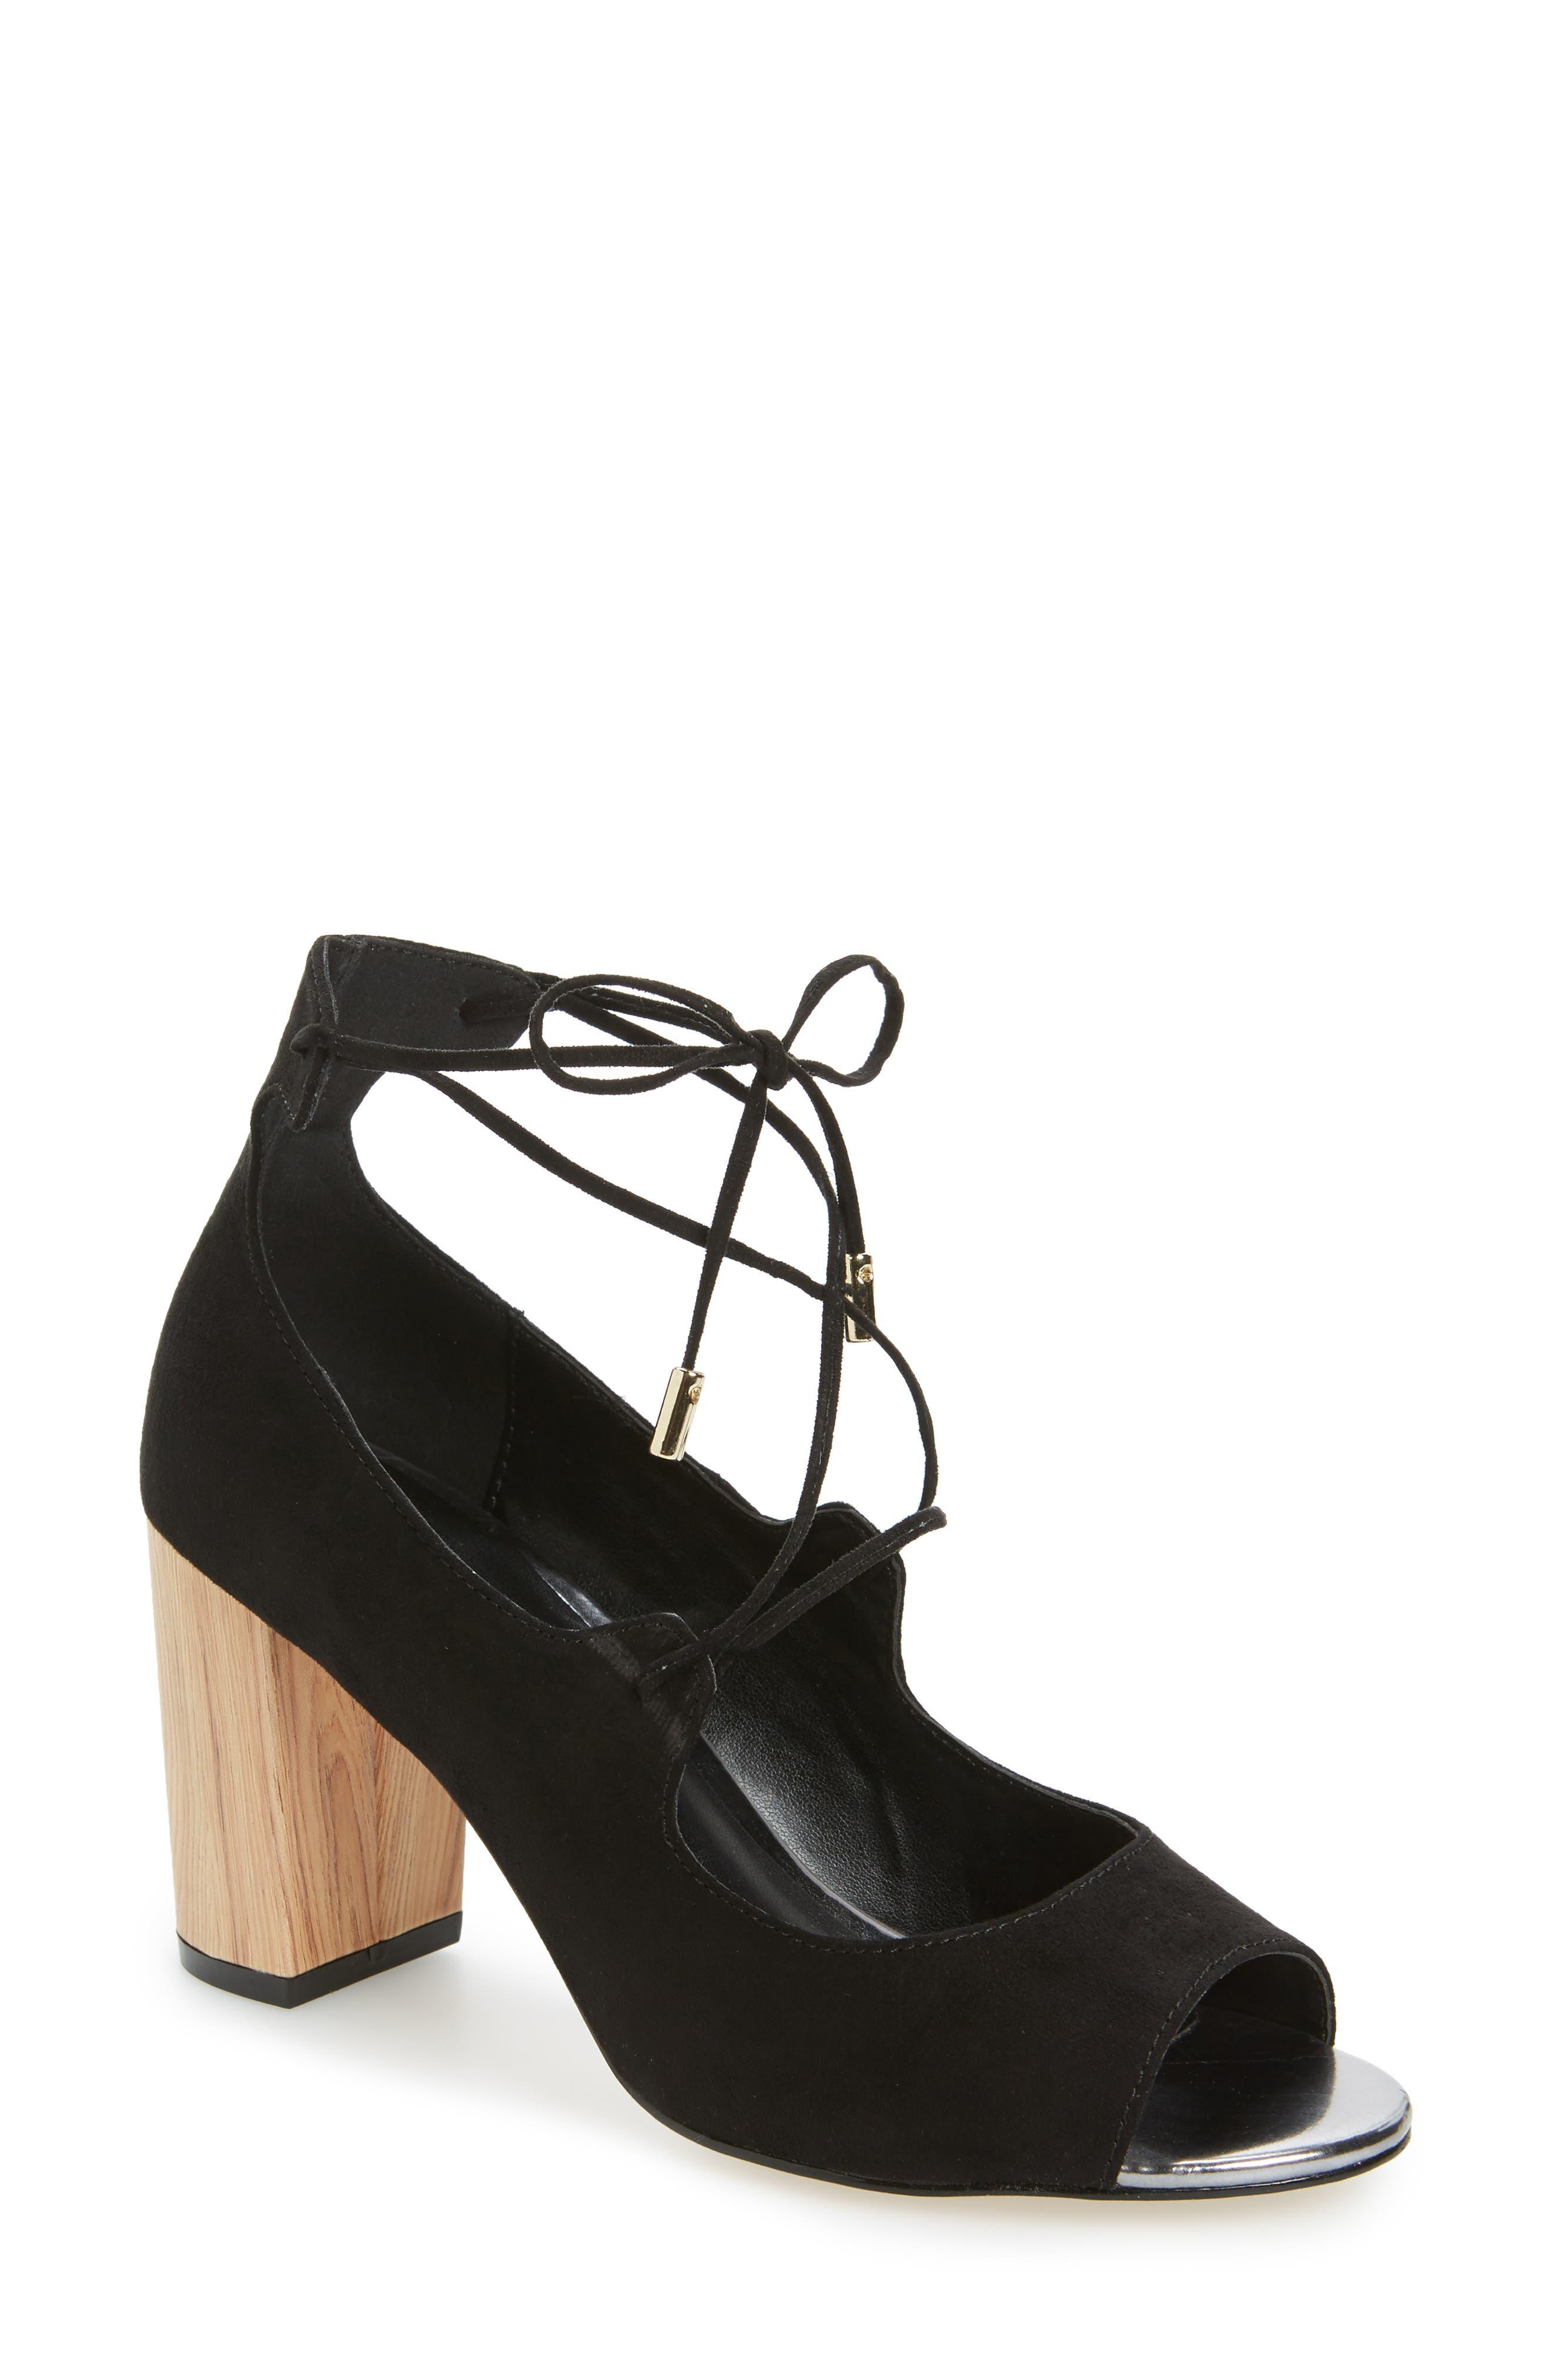 Alternate Image 1 Selected - Athena Alexander Vikki Block Heel Sandal (Women)